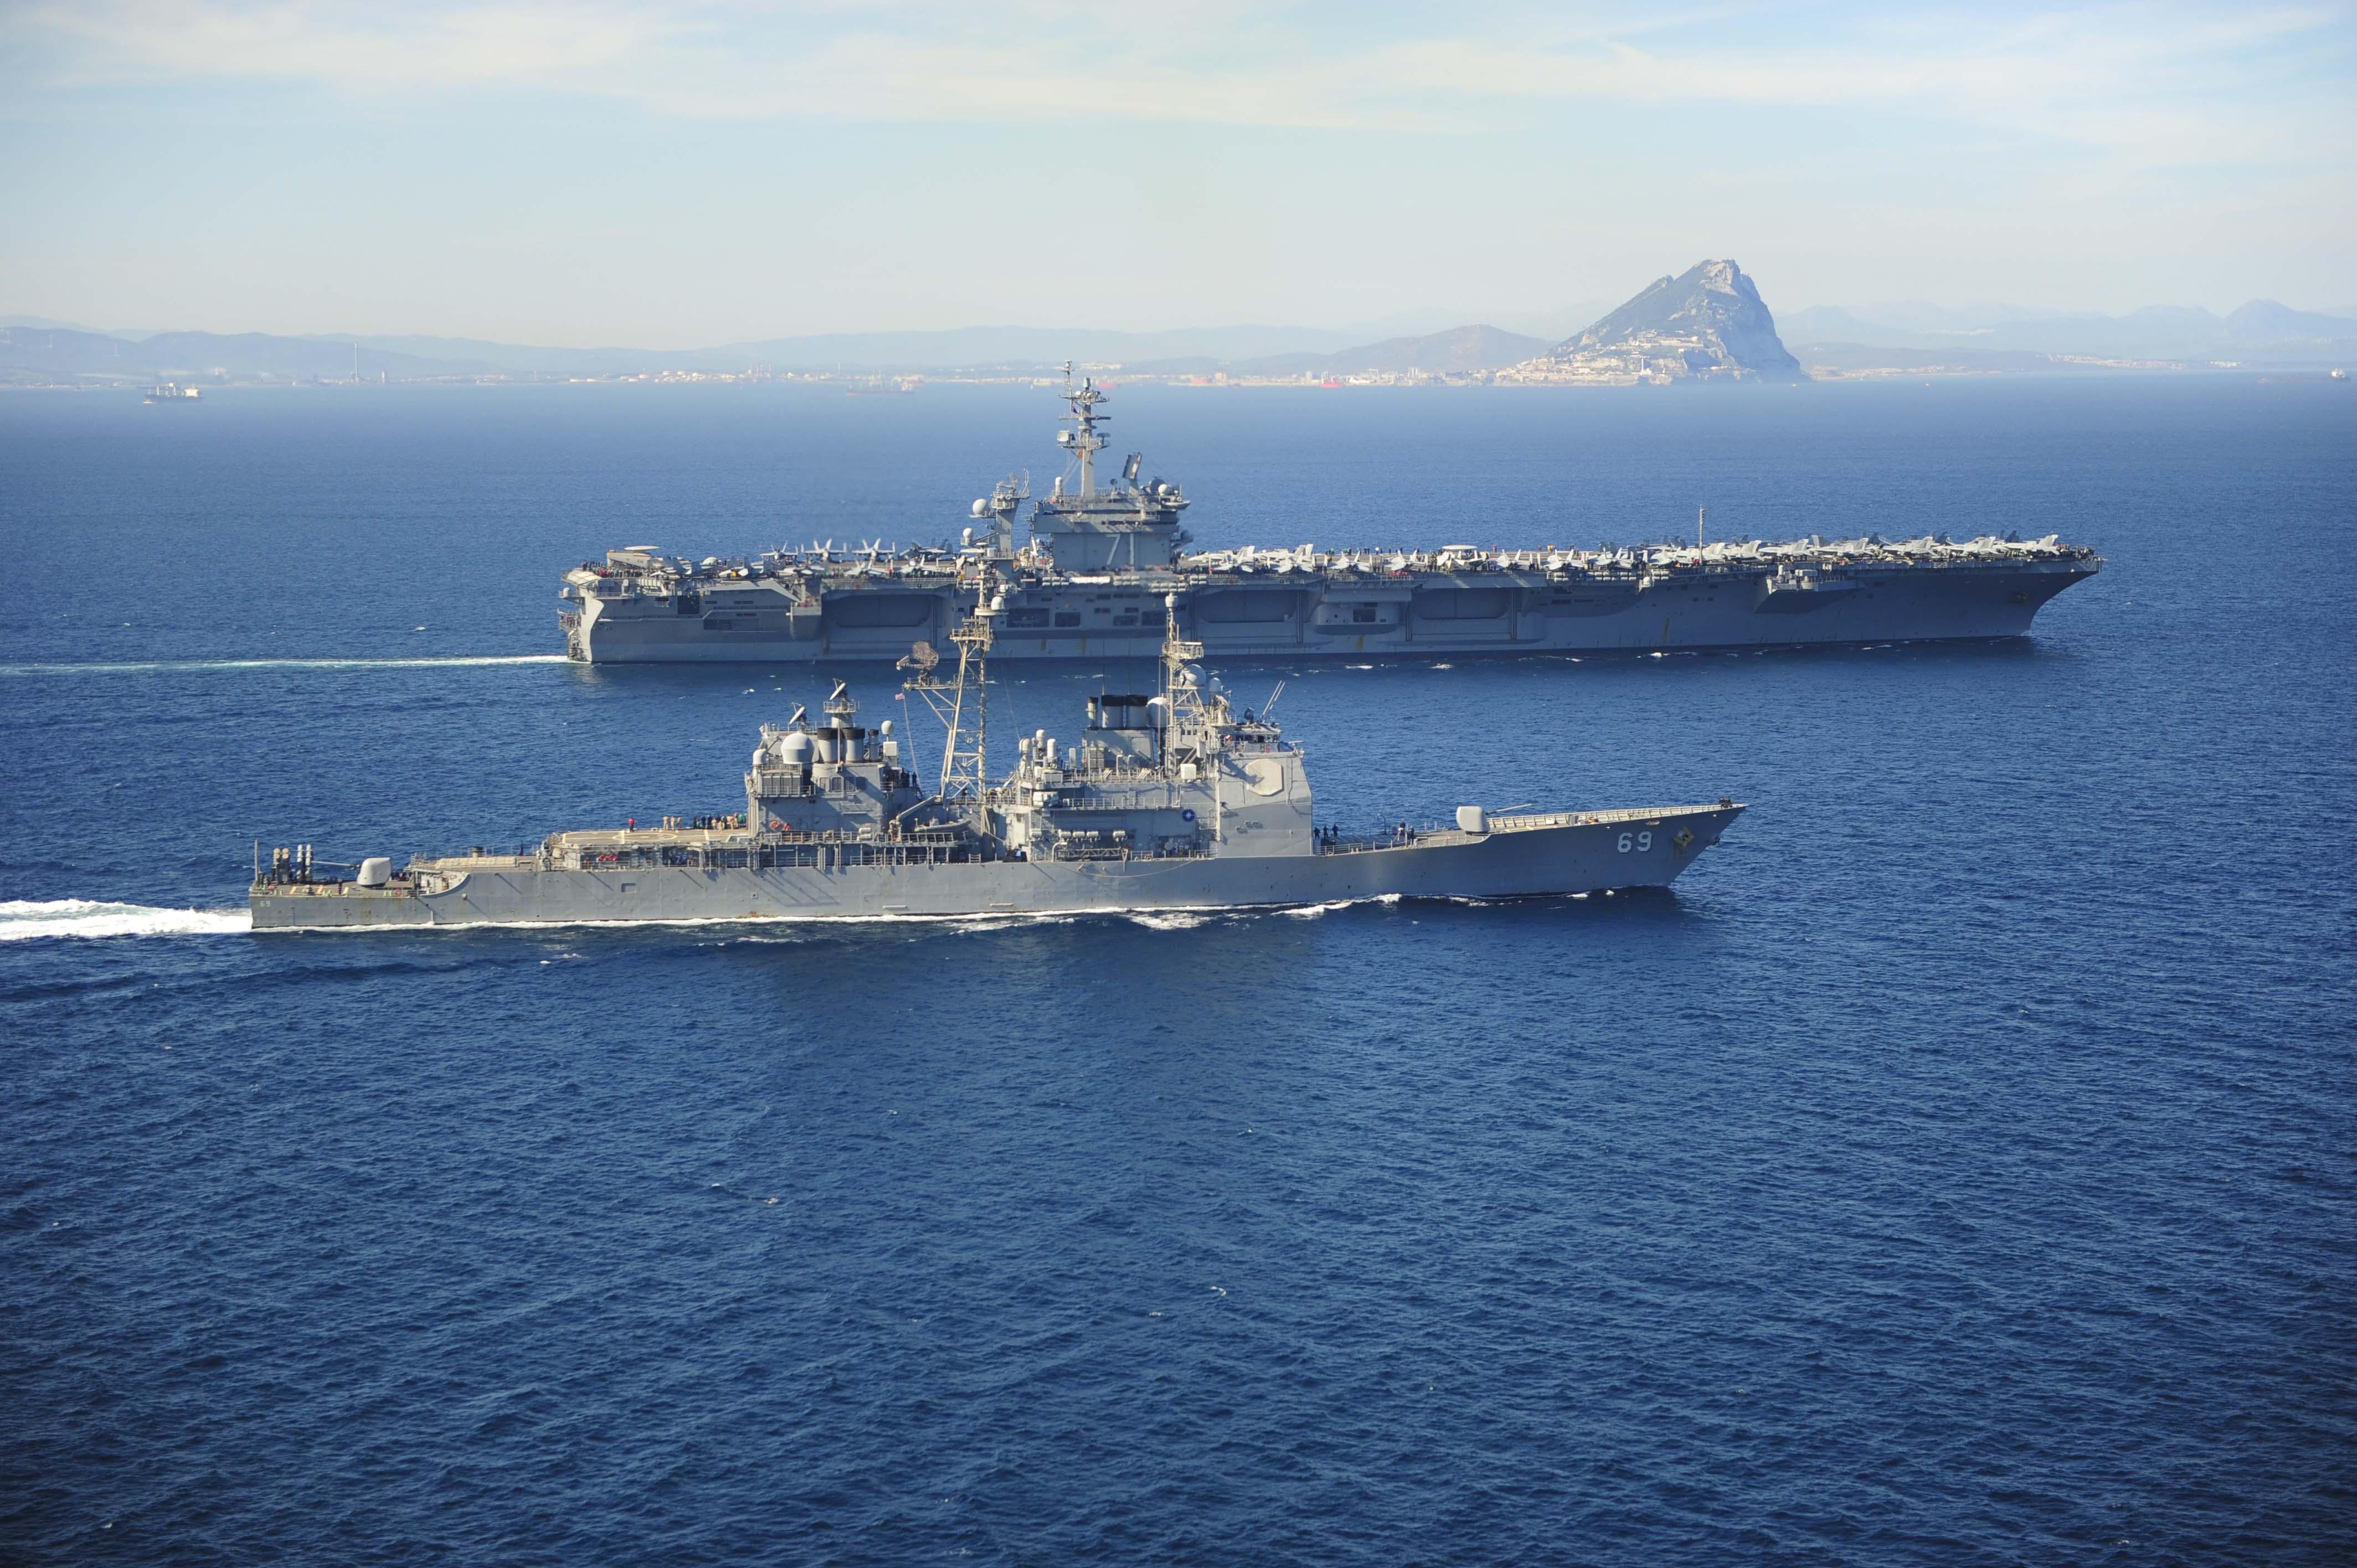 USS Vicksburg escorts USS Theodore Roosevelt past the Rock of Gibraltar.